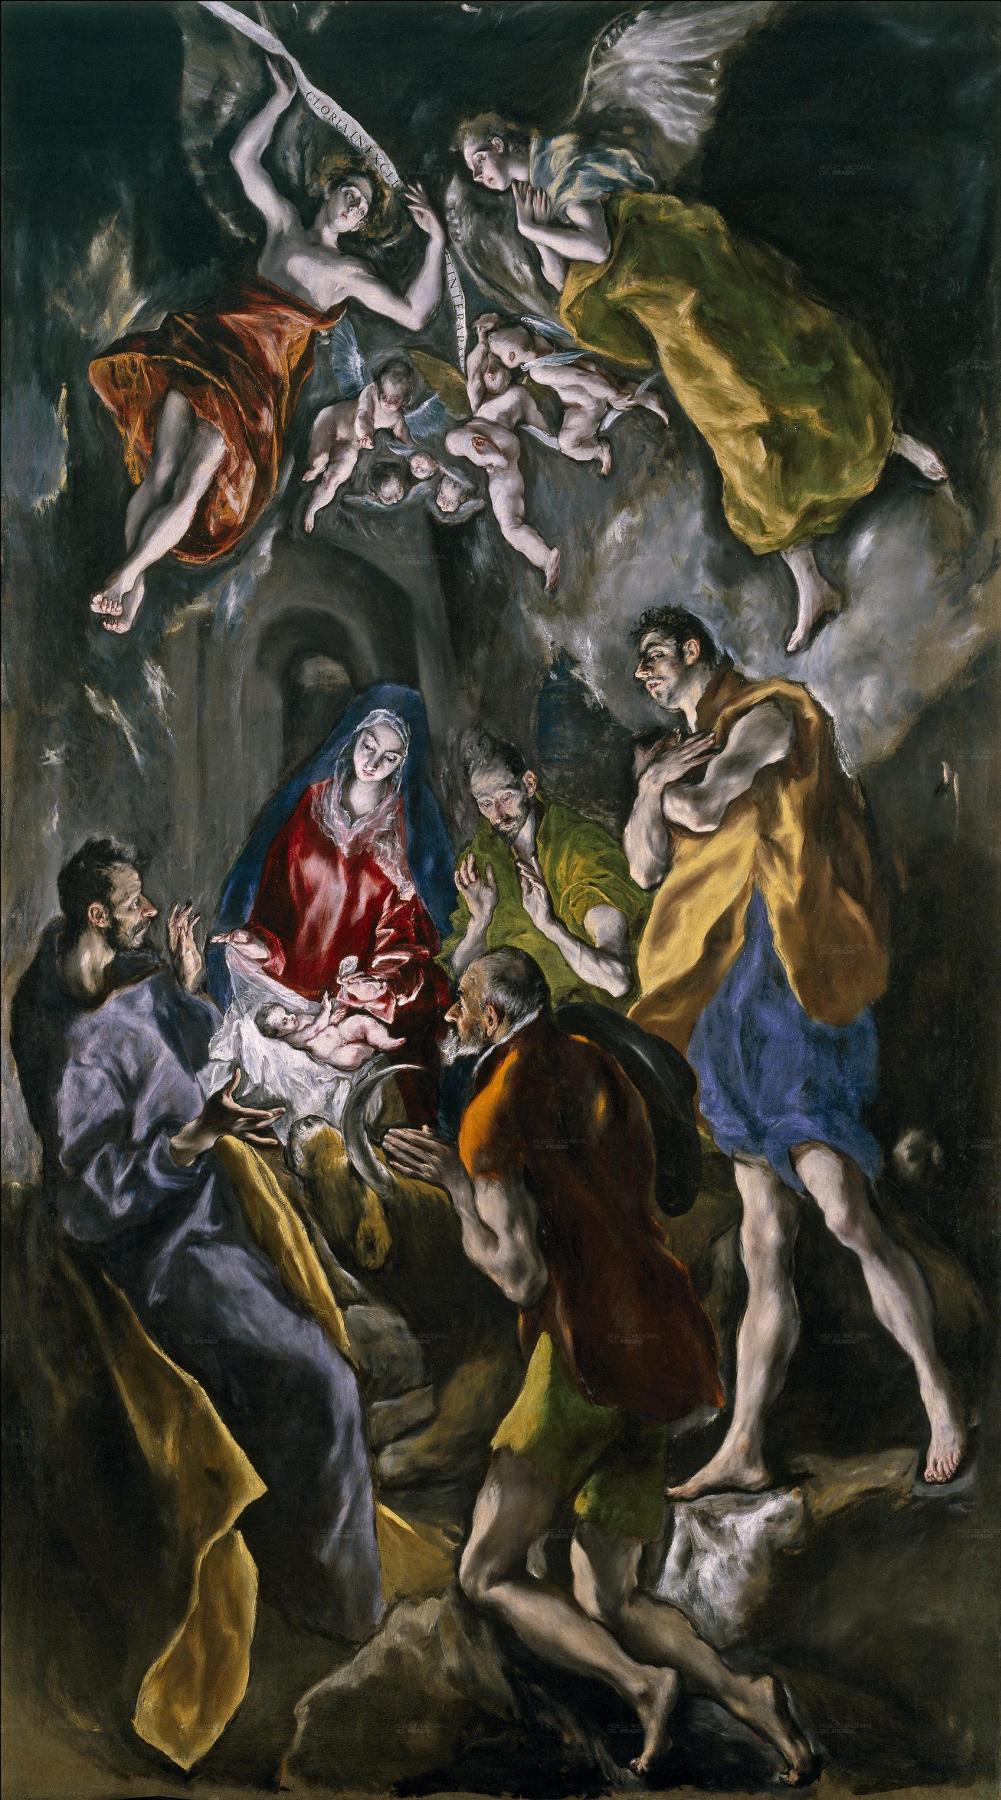 Domenico Theotokopoulos (El Greco). The adoration of the shepherds